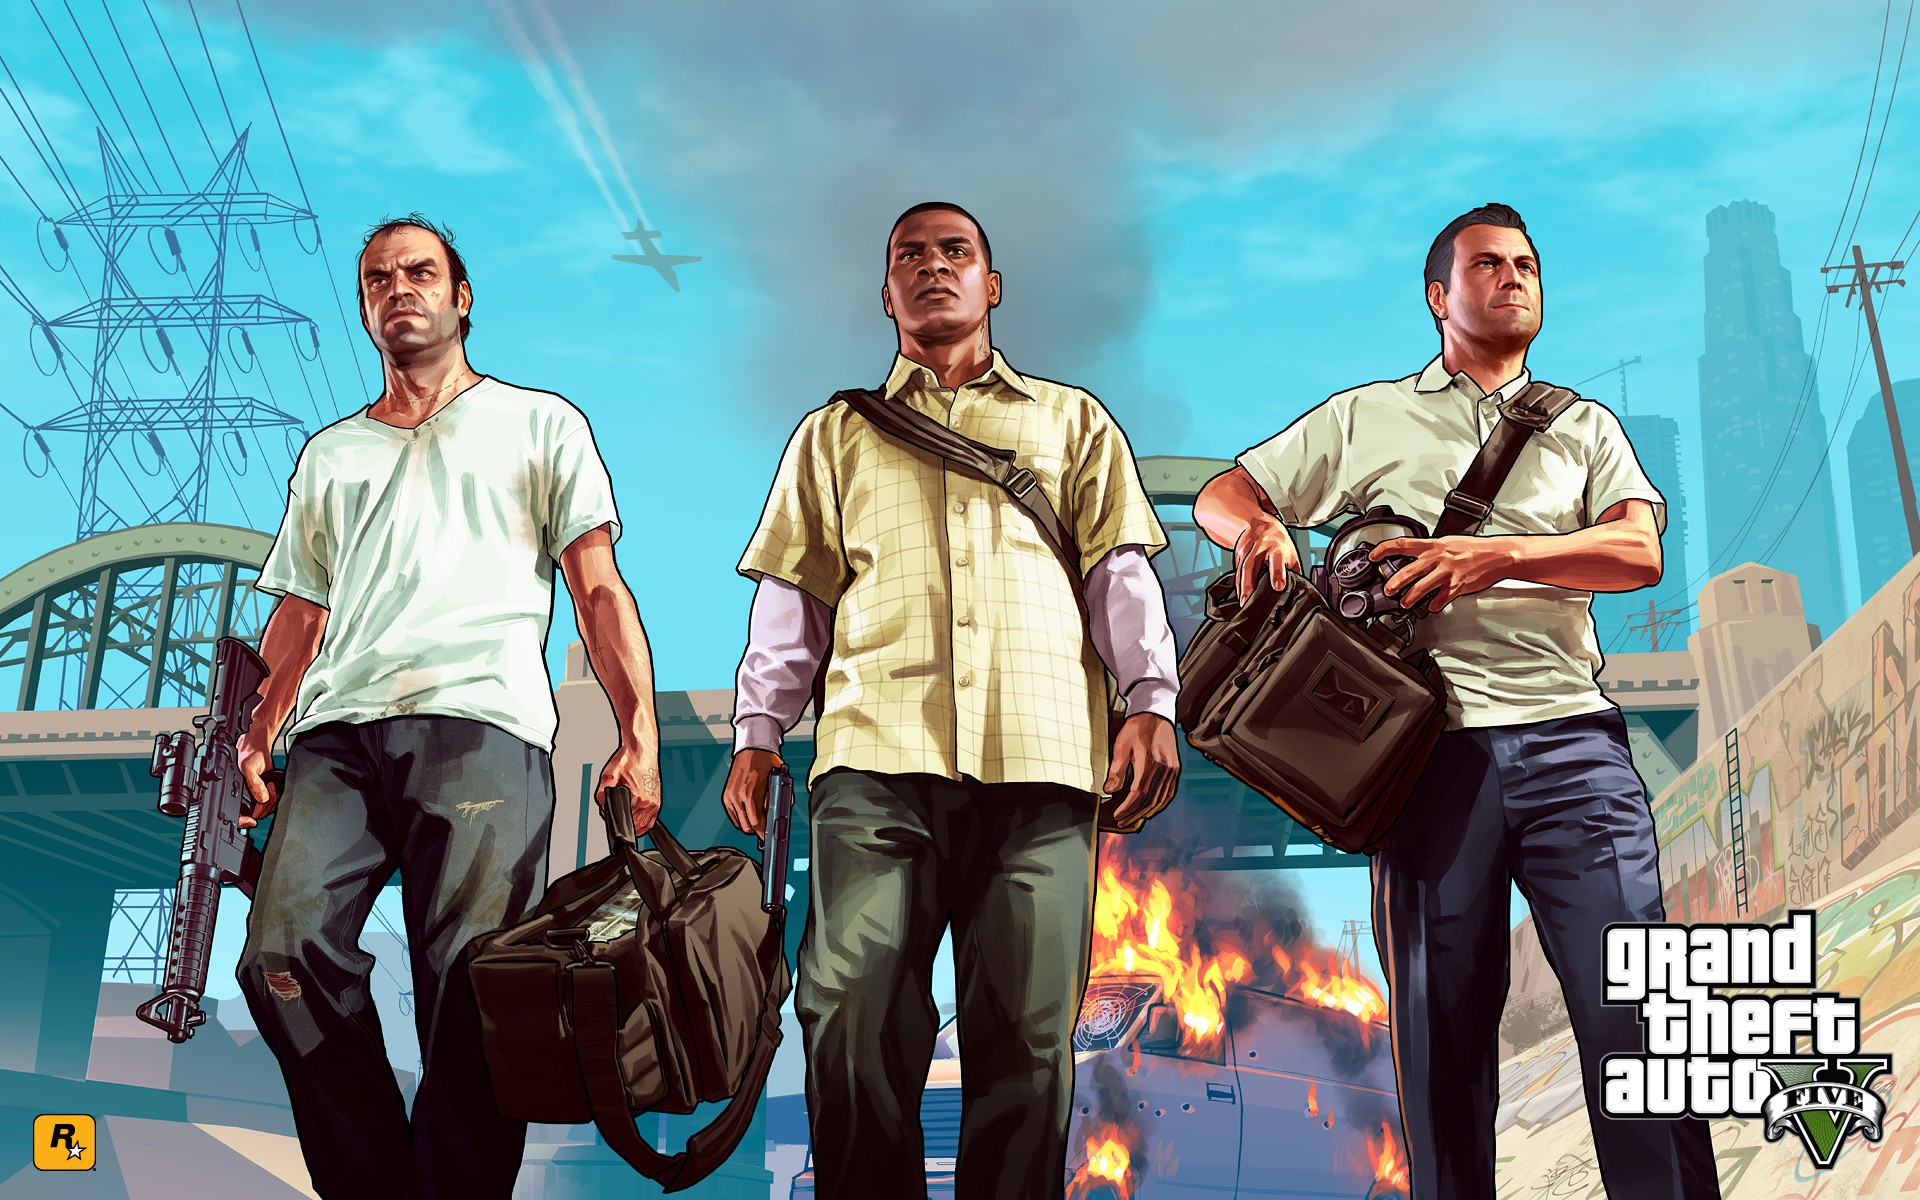 Artwork de la saga Grand Theft Auto